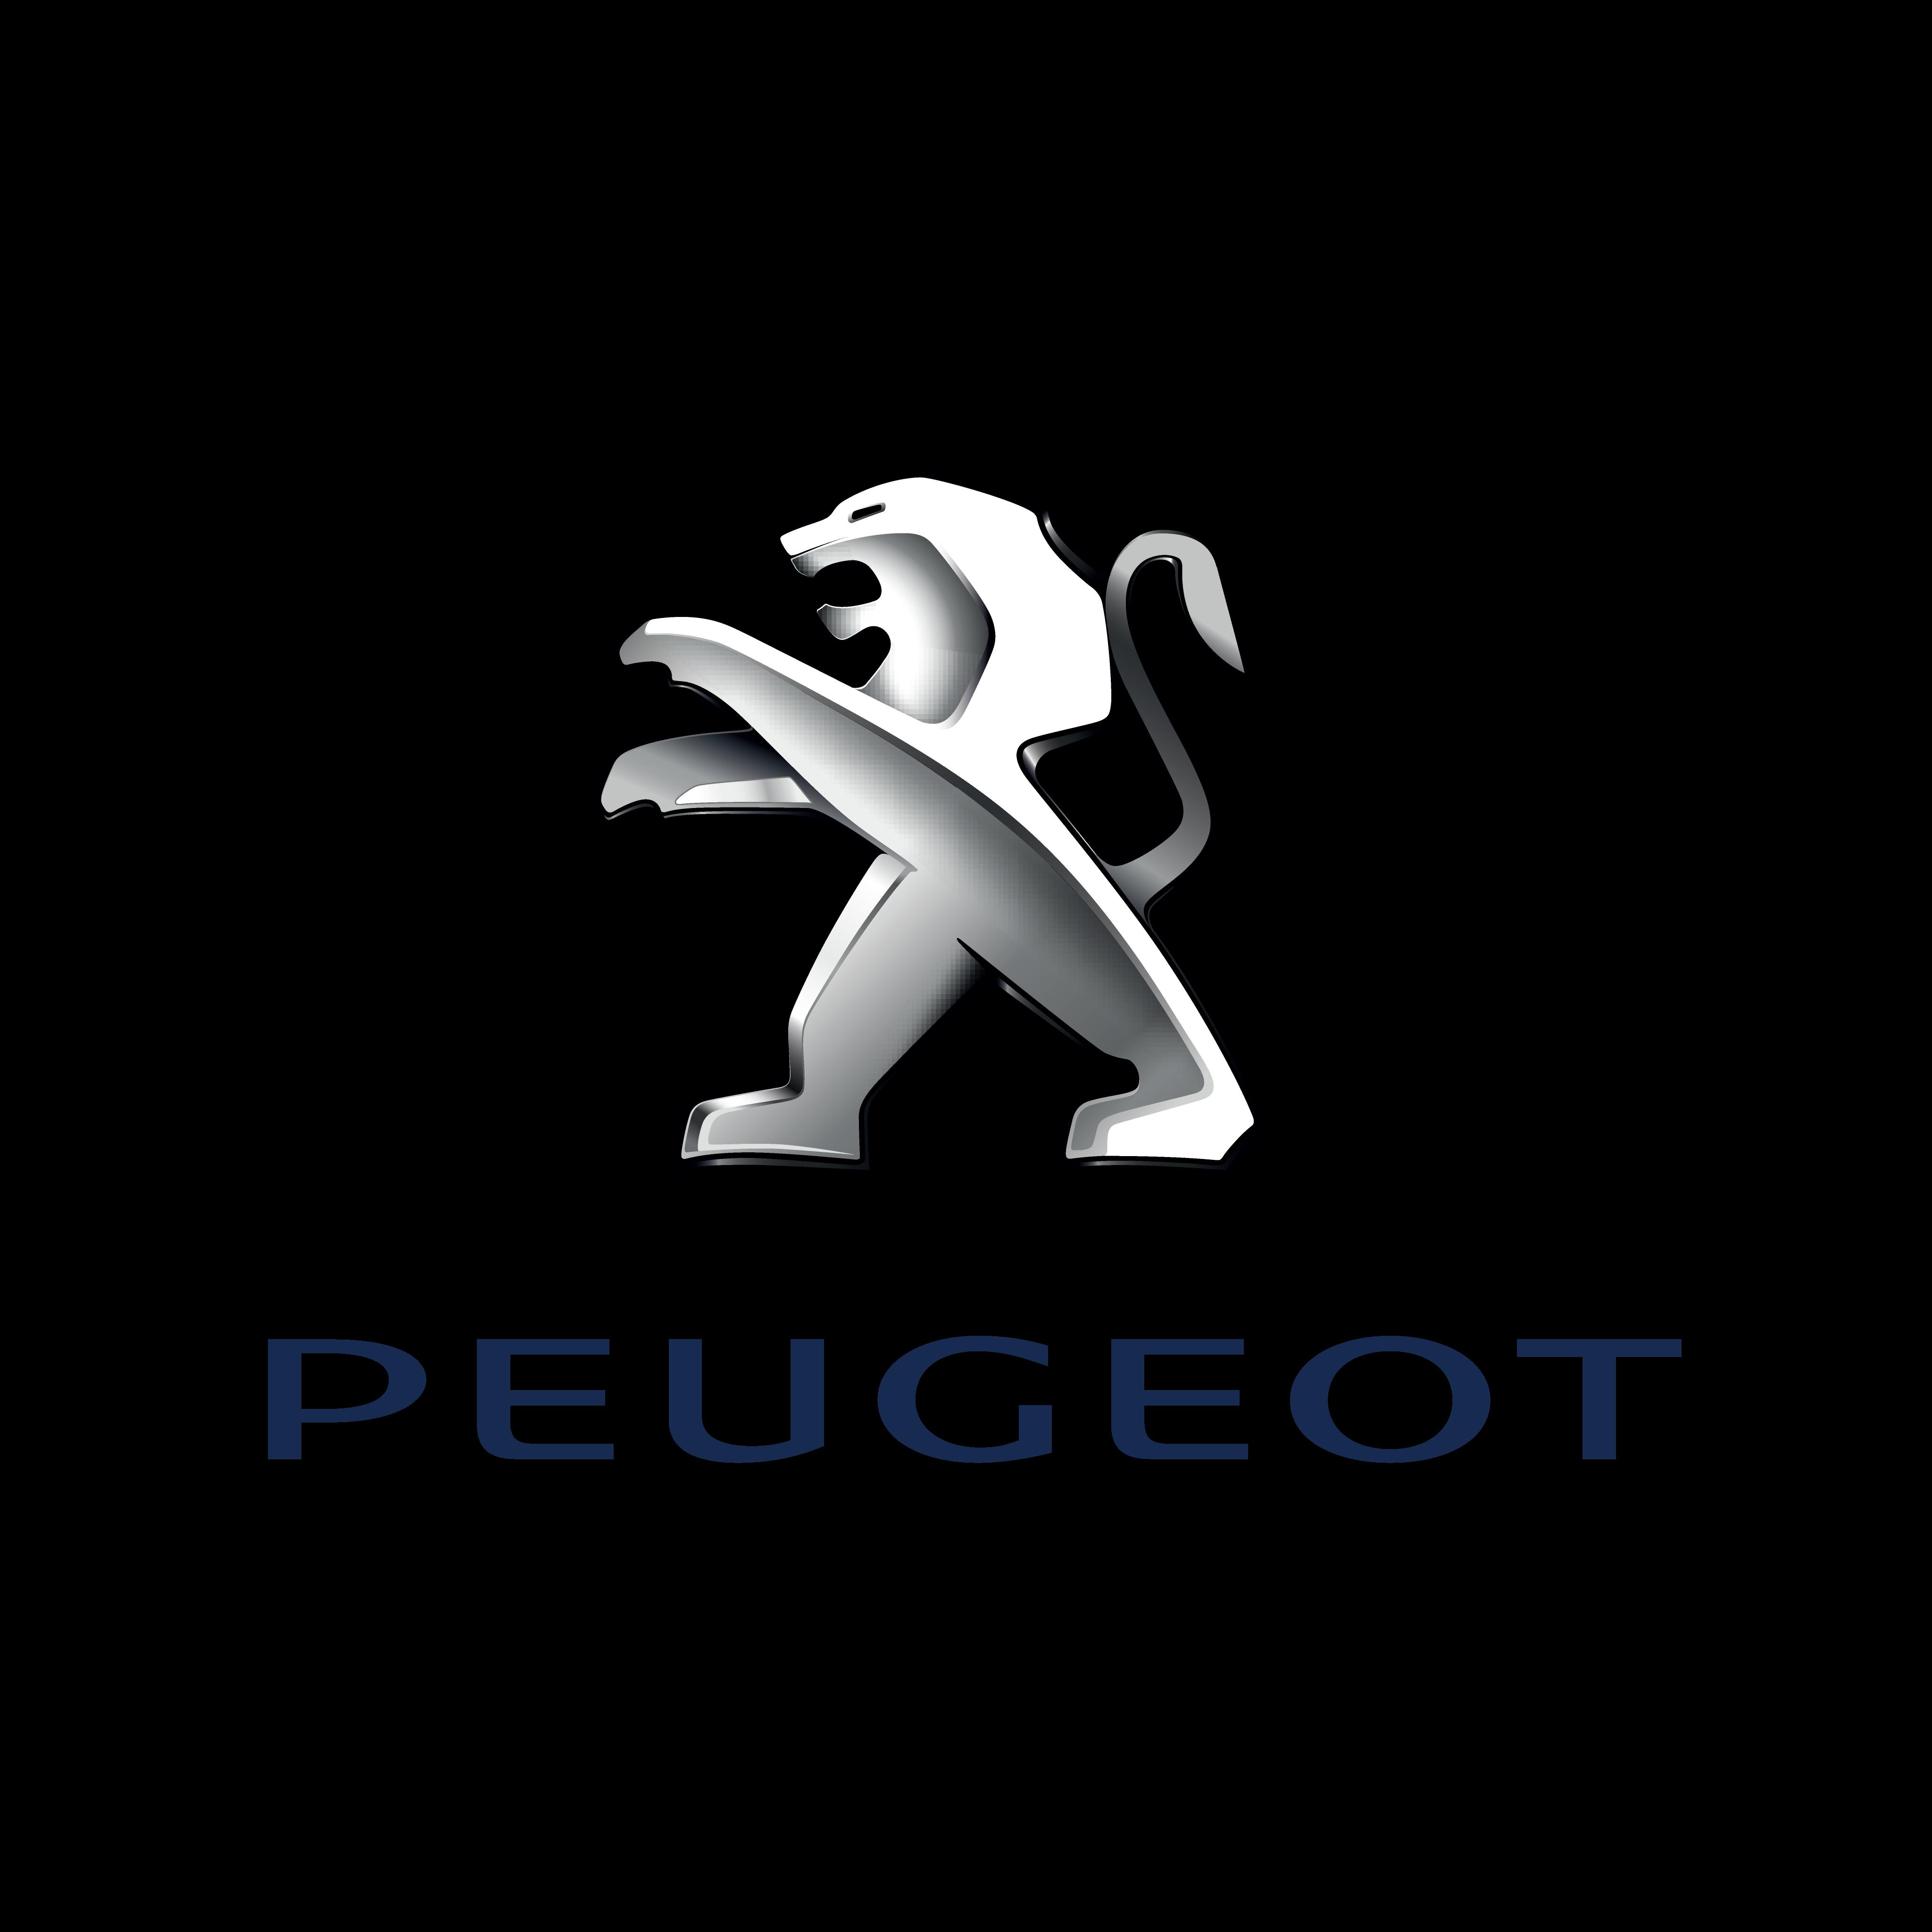 peugeot logo 0 - Peugeot Logo